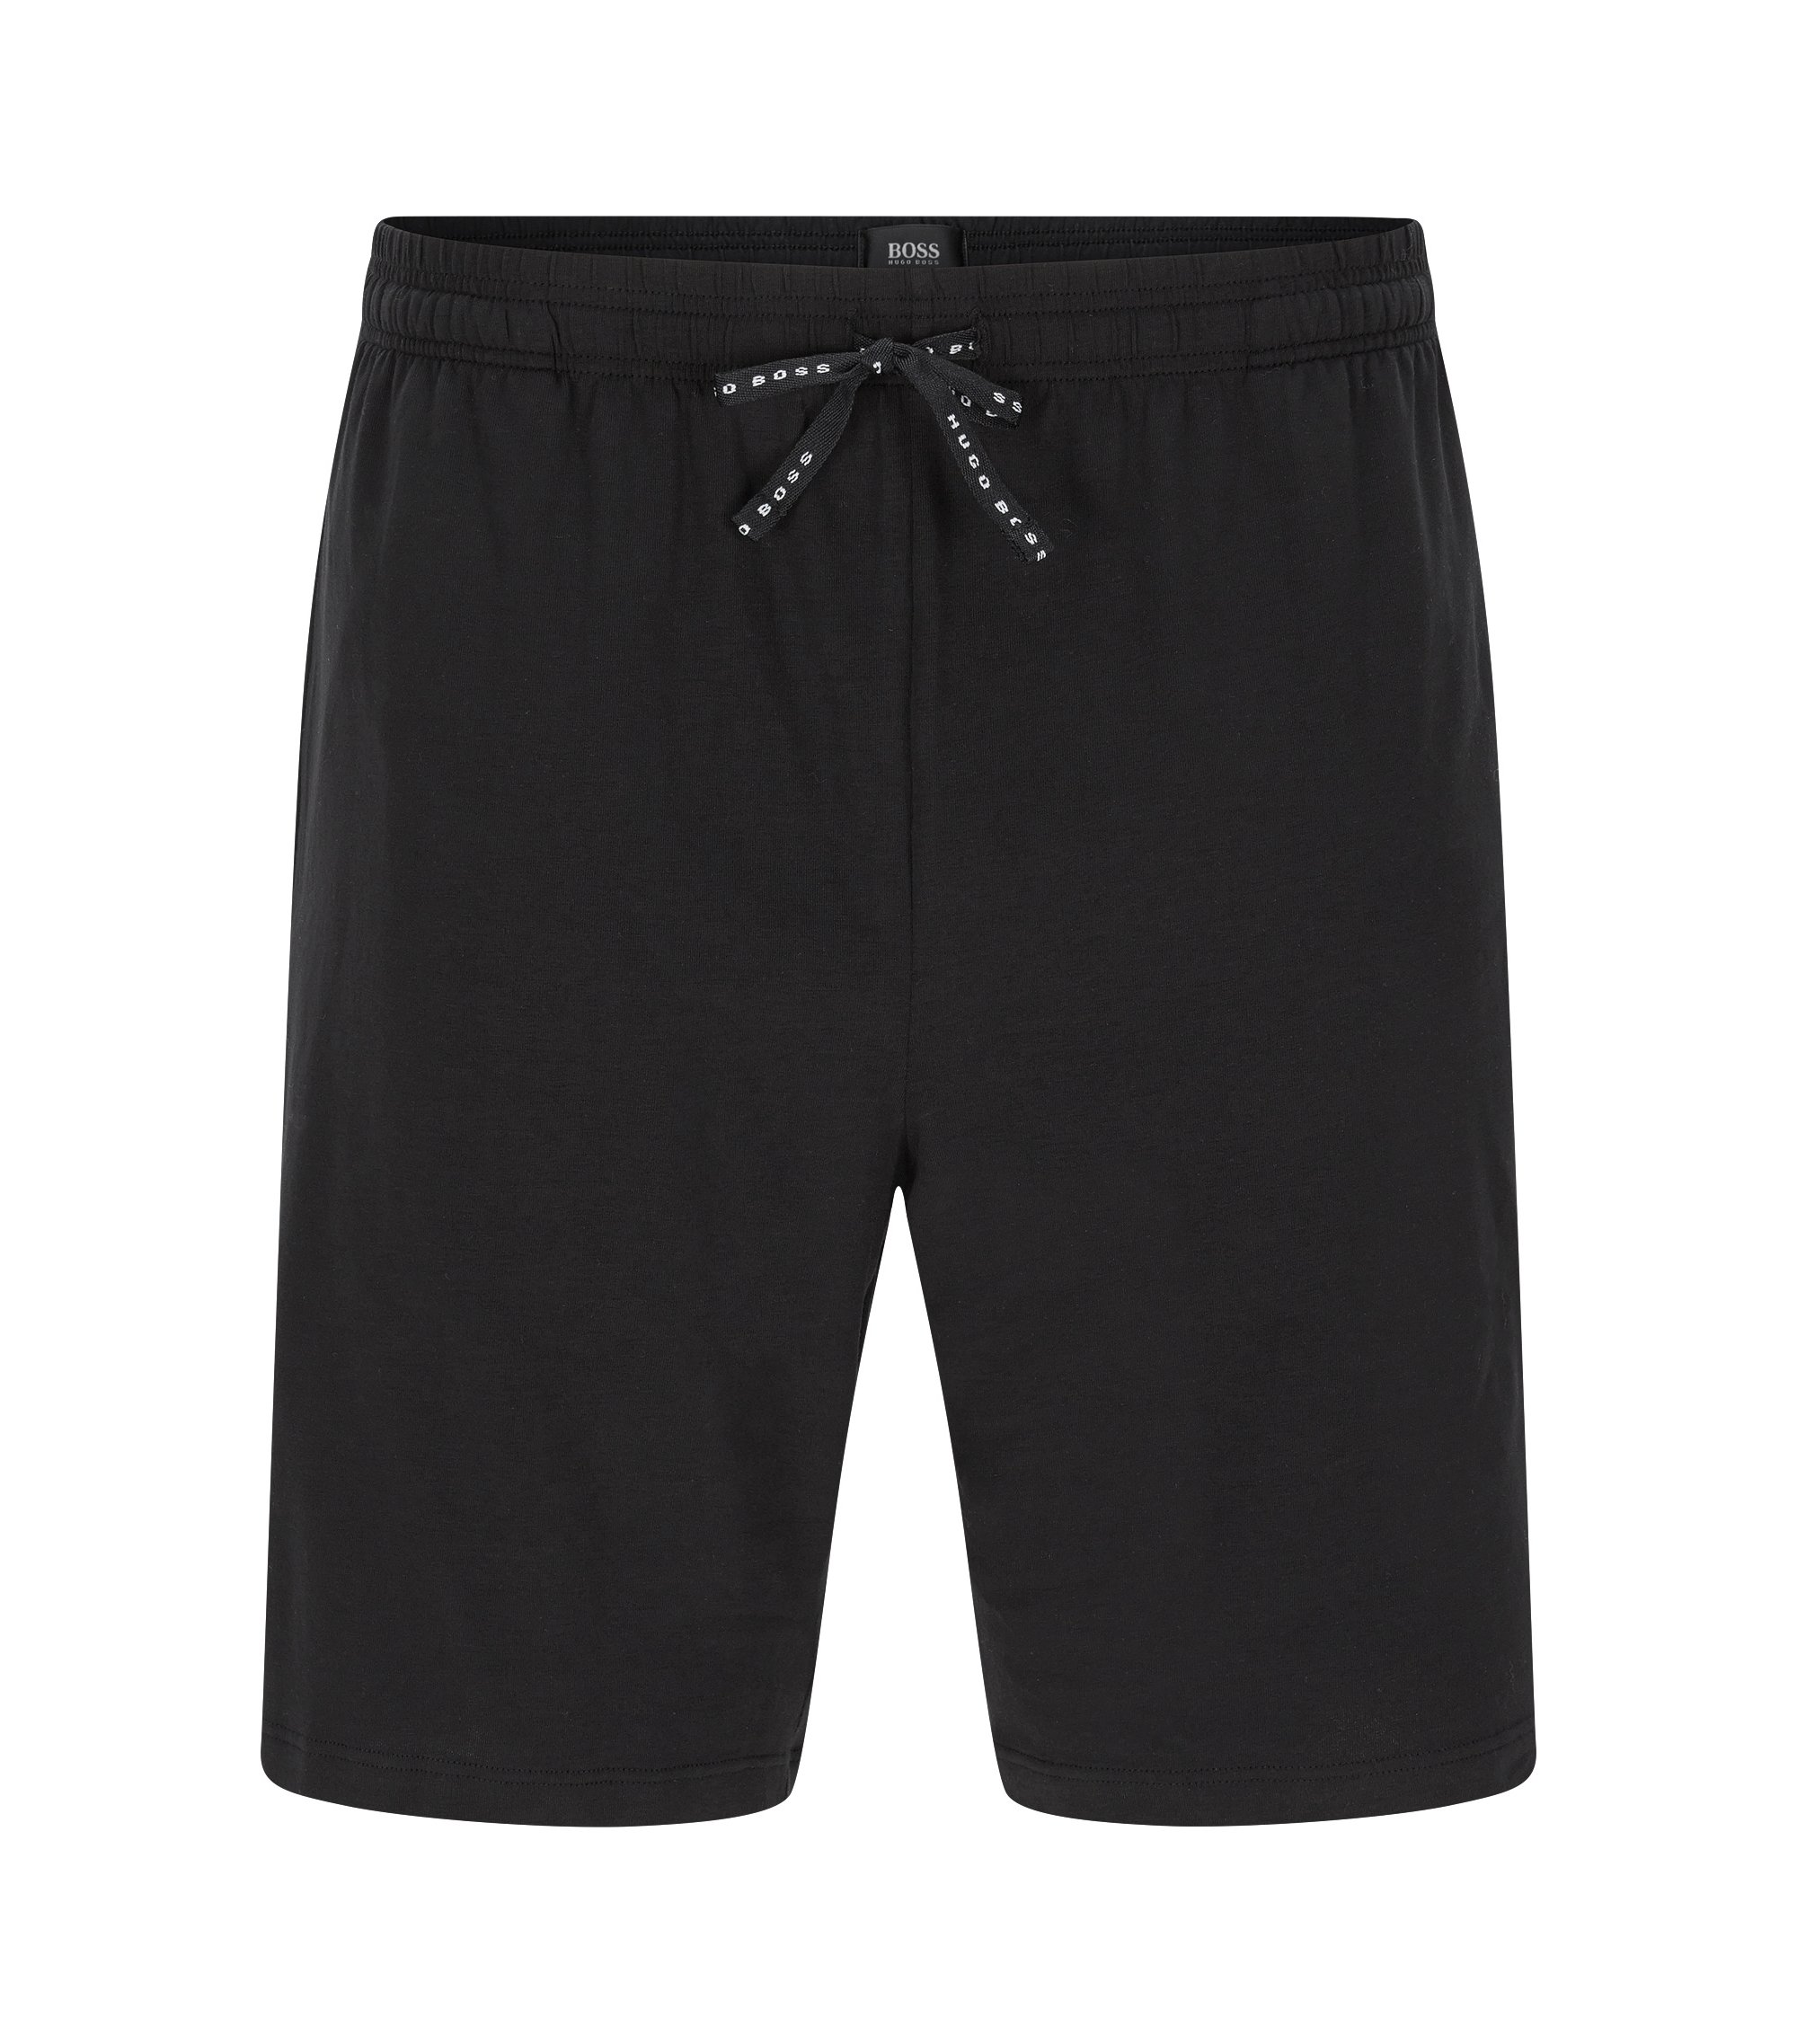 Shorts in stretch cotton: 'Short Pant CV', Black